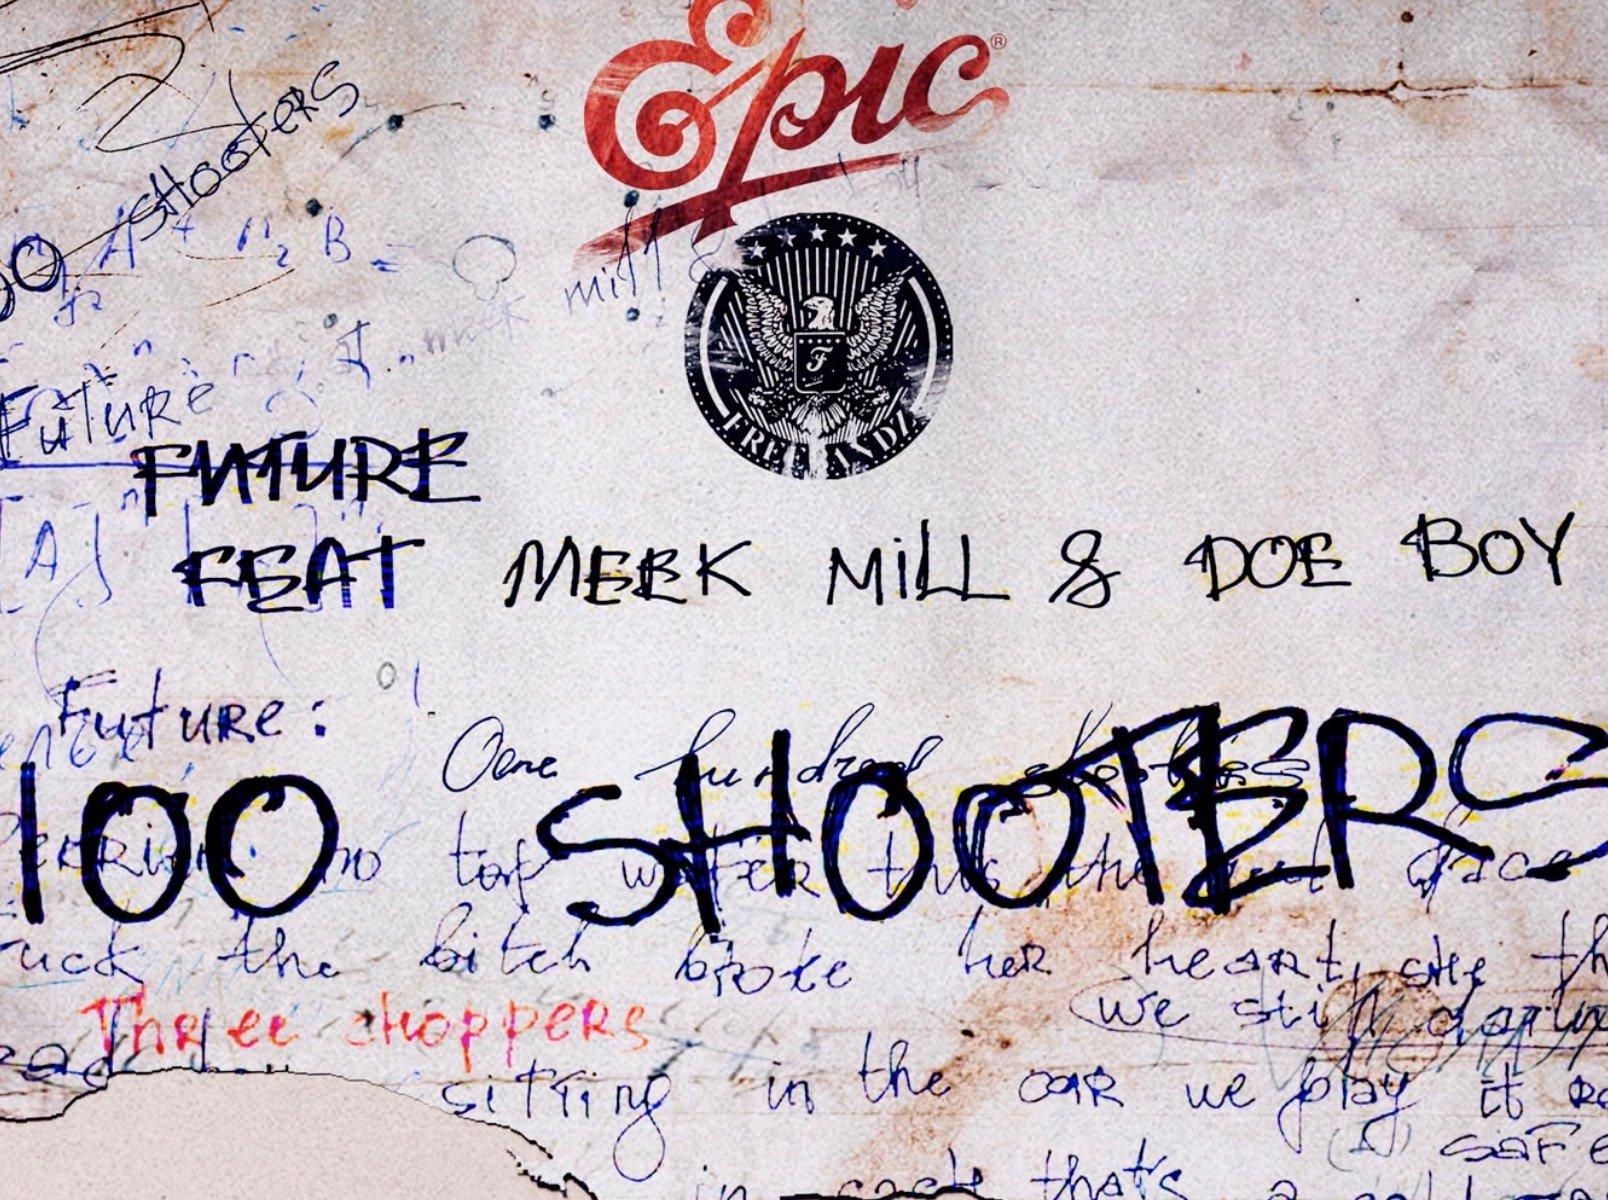 100 Shooters Future Meek Mill